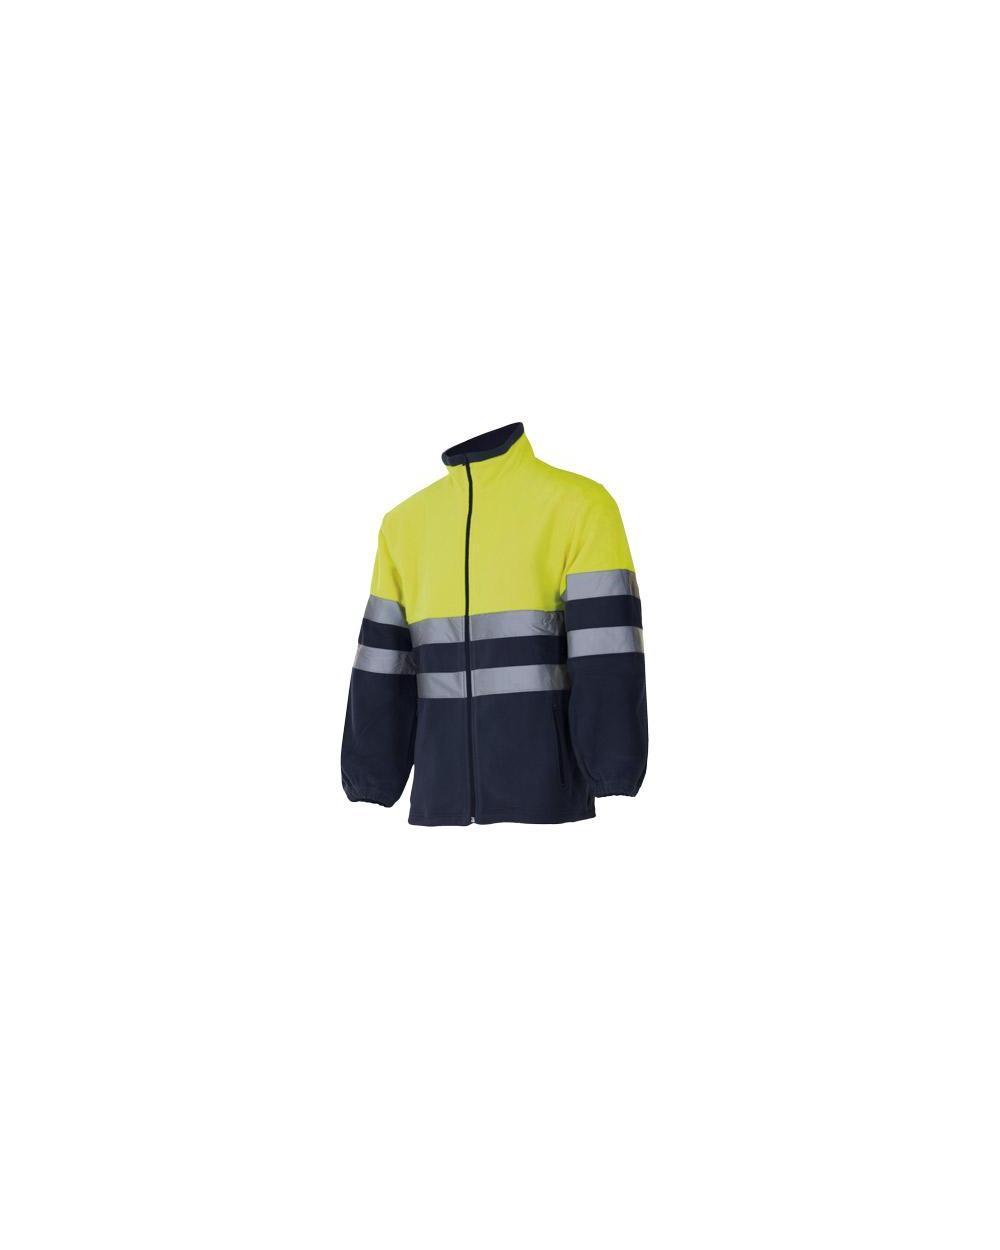 Comprar Chaqueta polar bicolor alta visibilidad serie 301503 online barato Amarillo Fluor